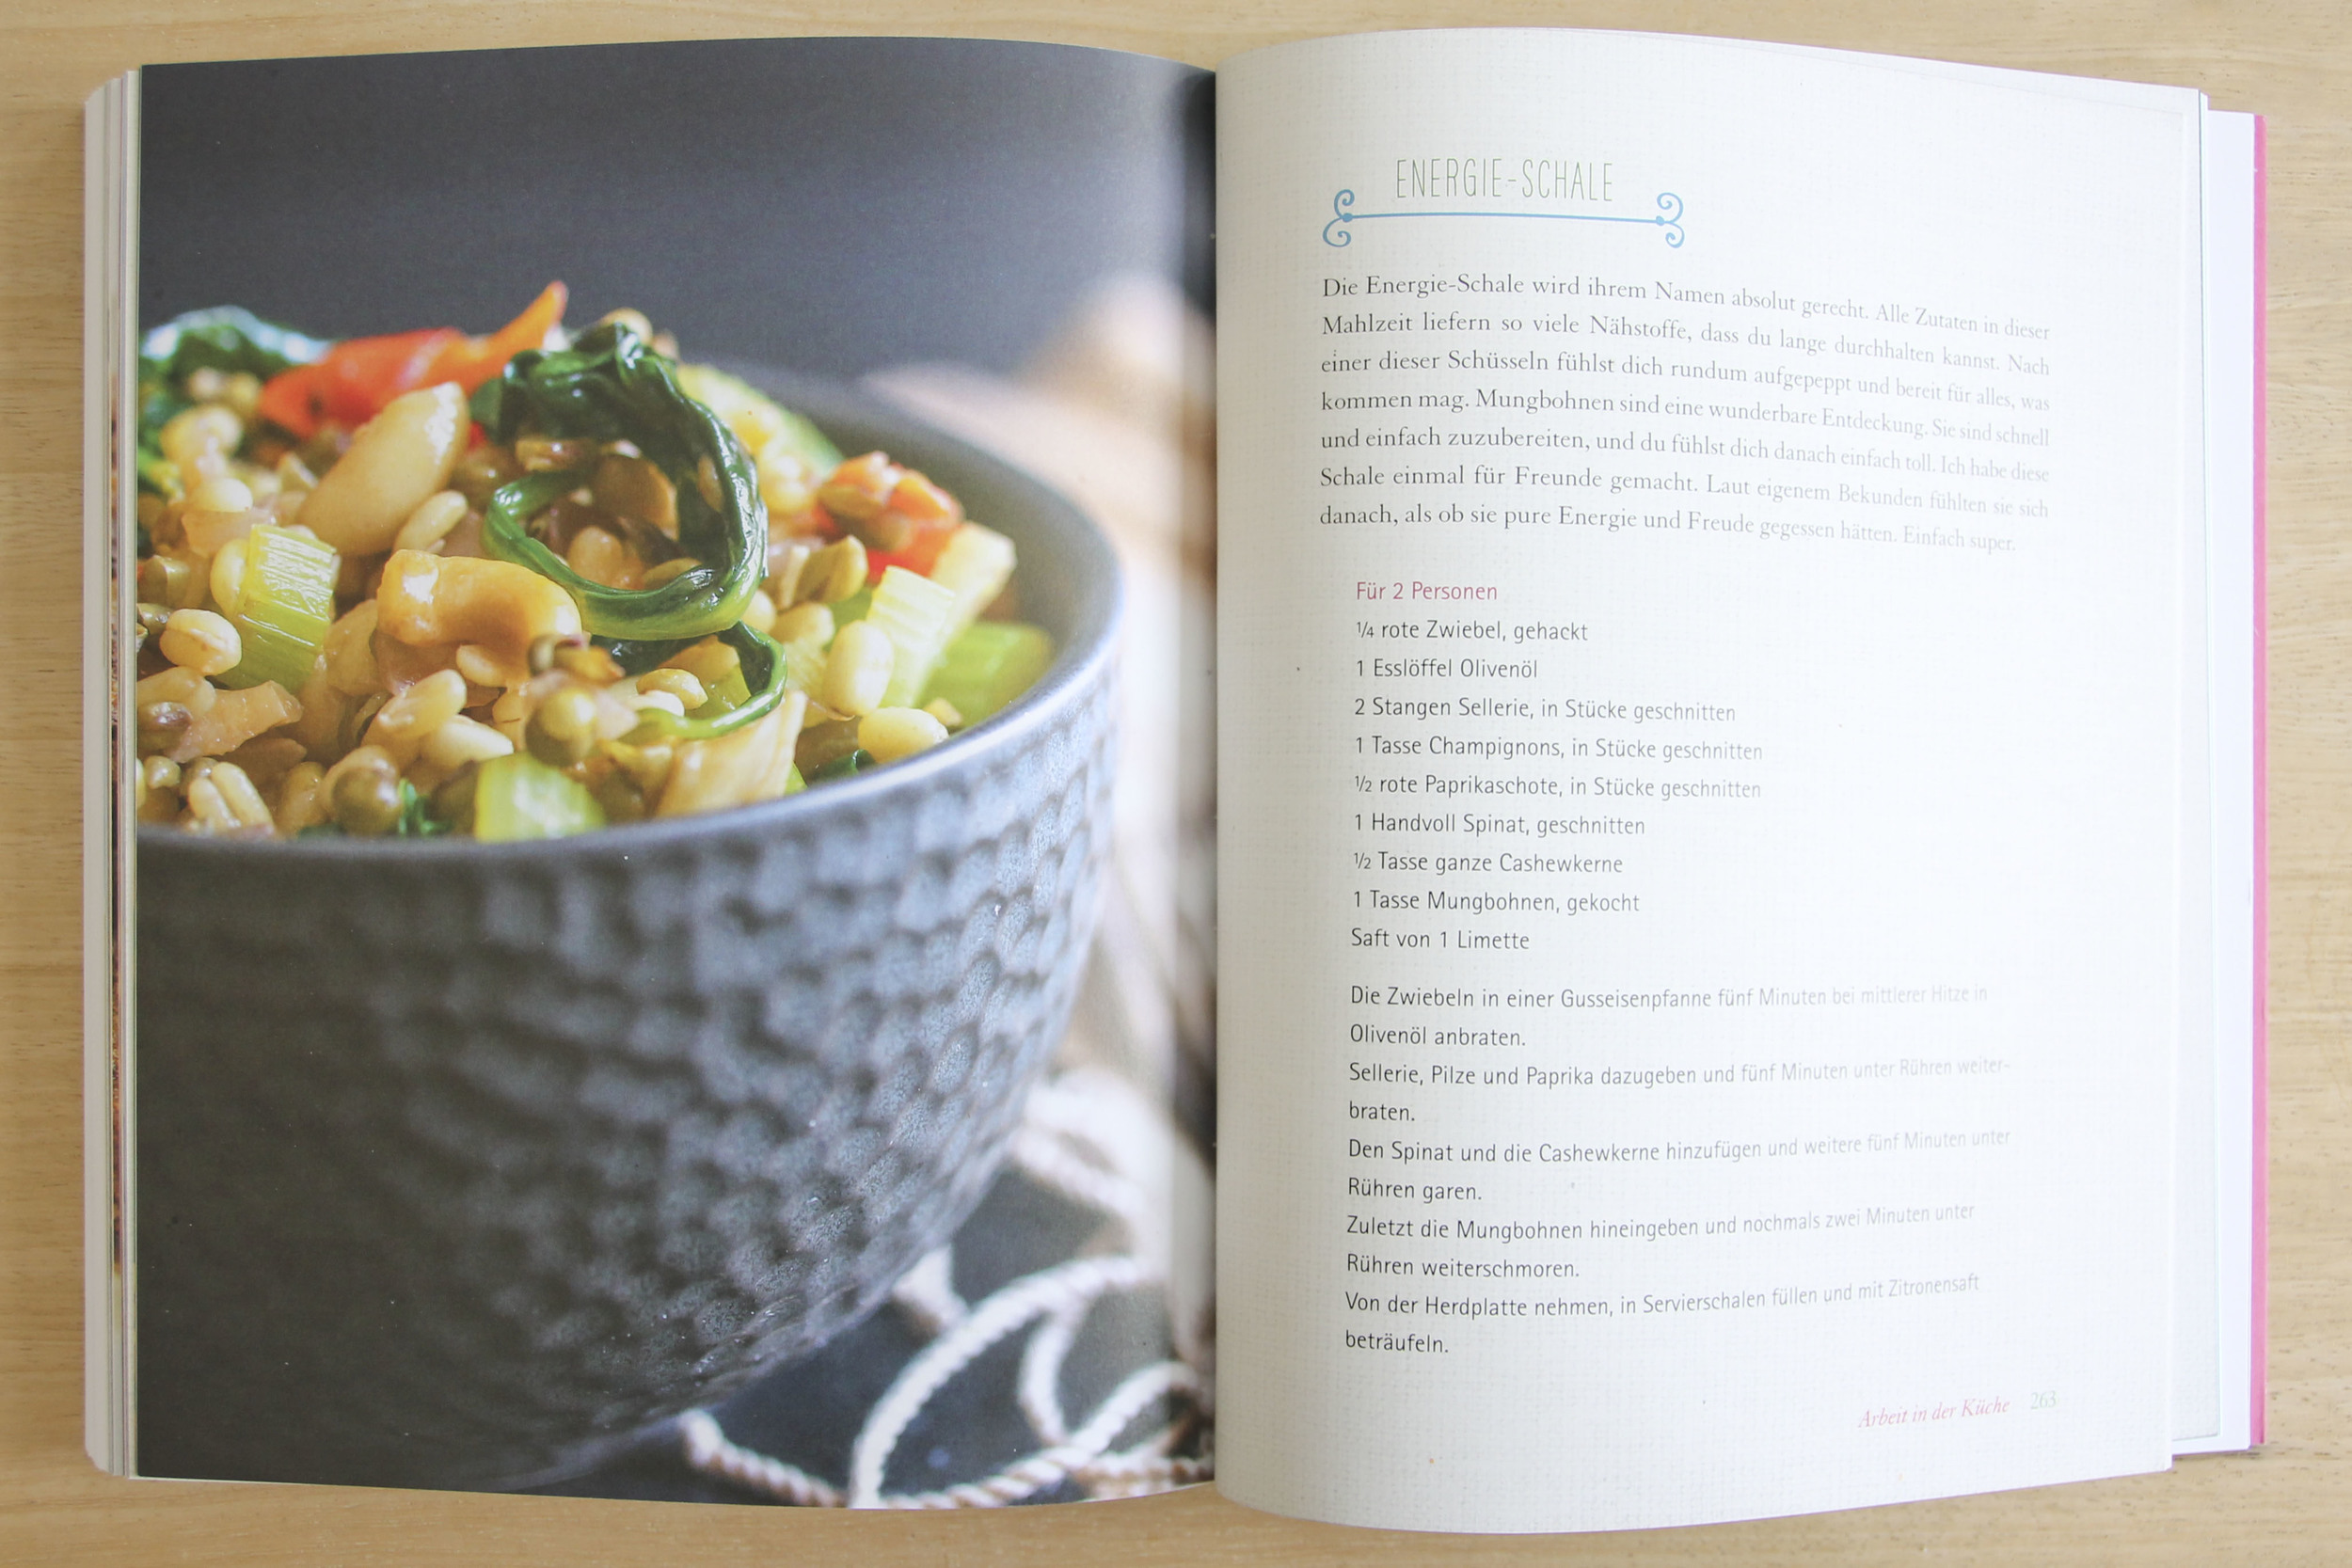 Tara Stiles, dein Yoga dein Leben, Rezeptbuch, Yoga Buch, Ratgeber3237.jpg